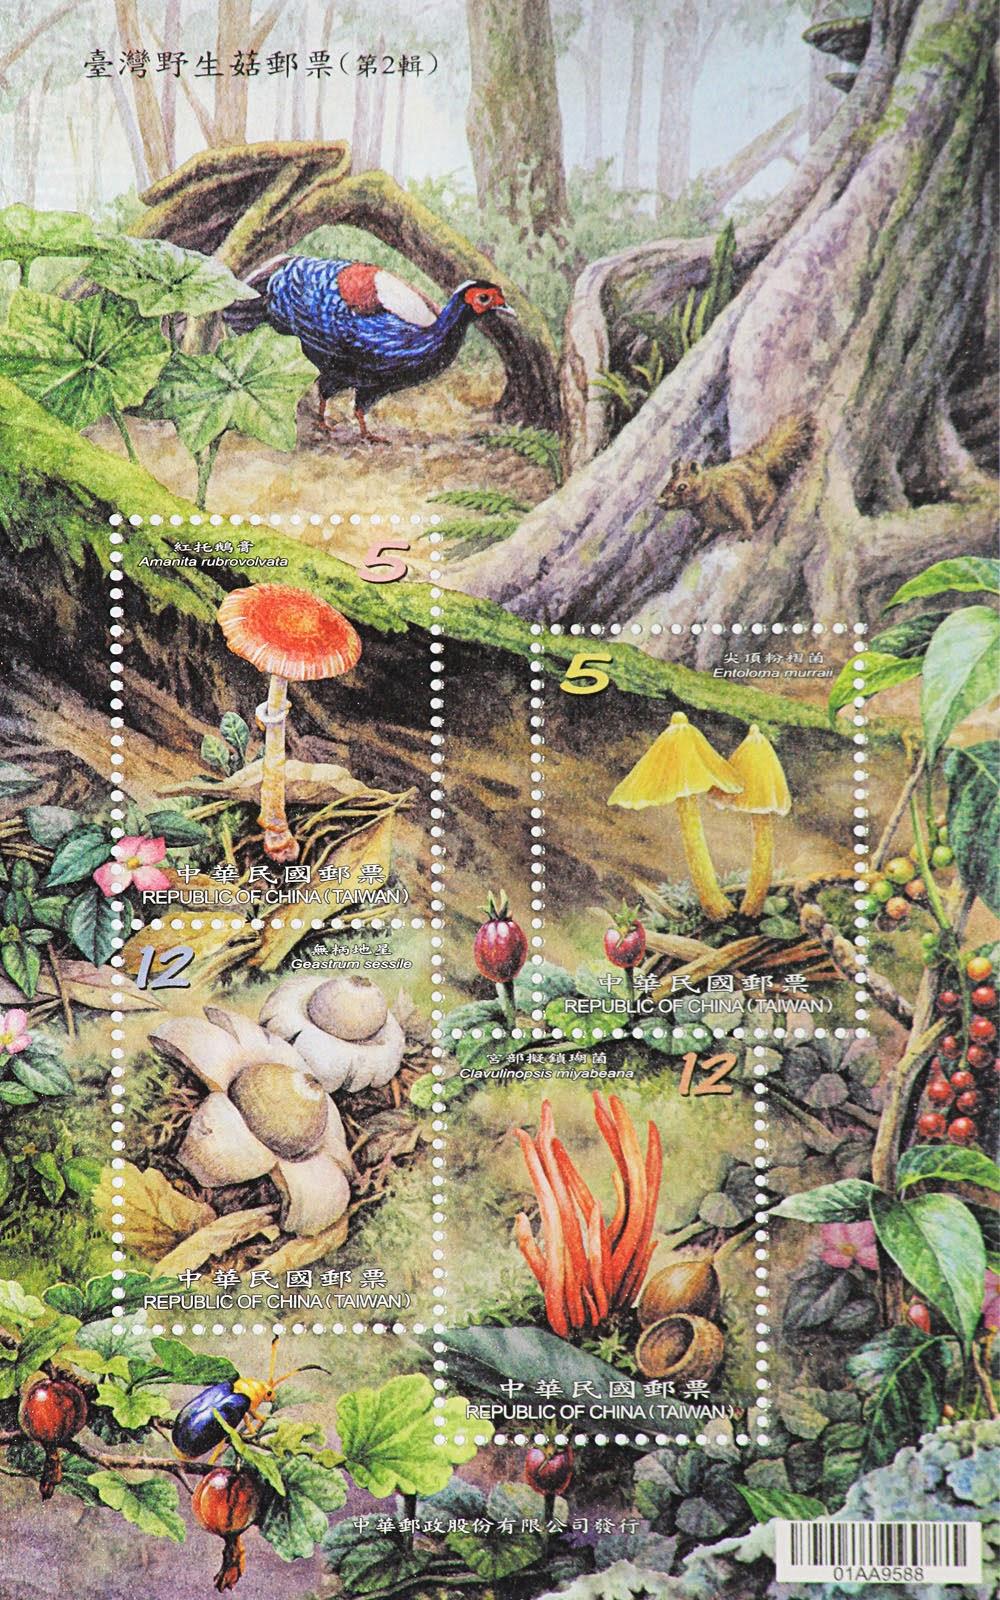 2012 Wild Mushrooms of Taiwan Miniature Sheet